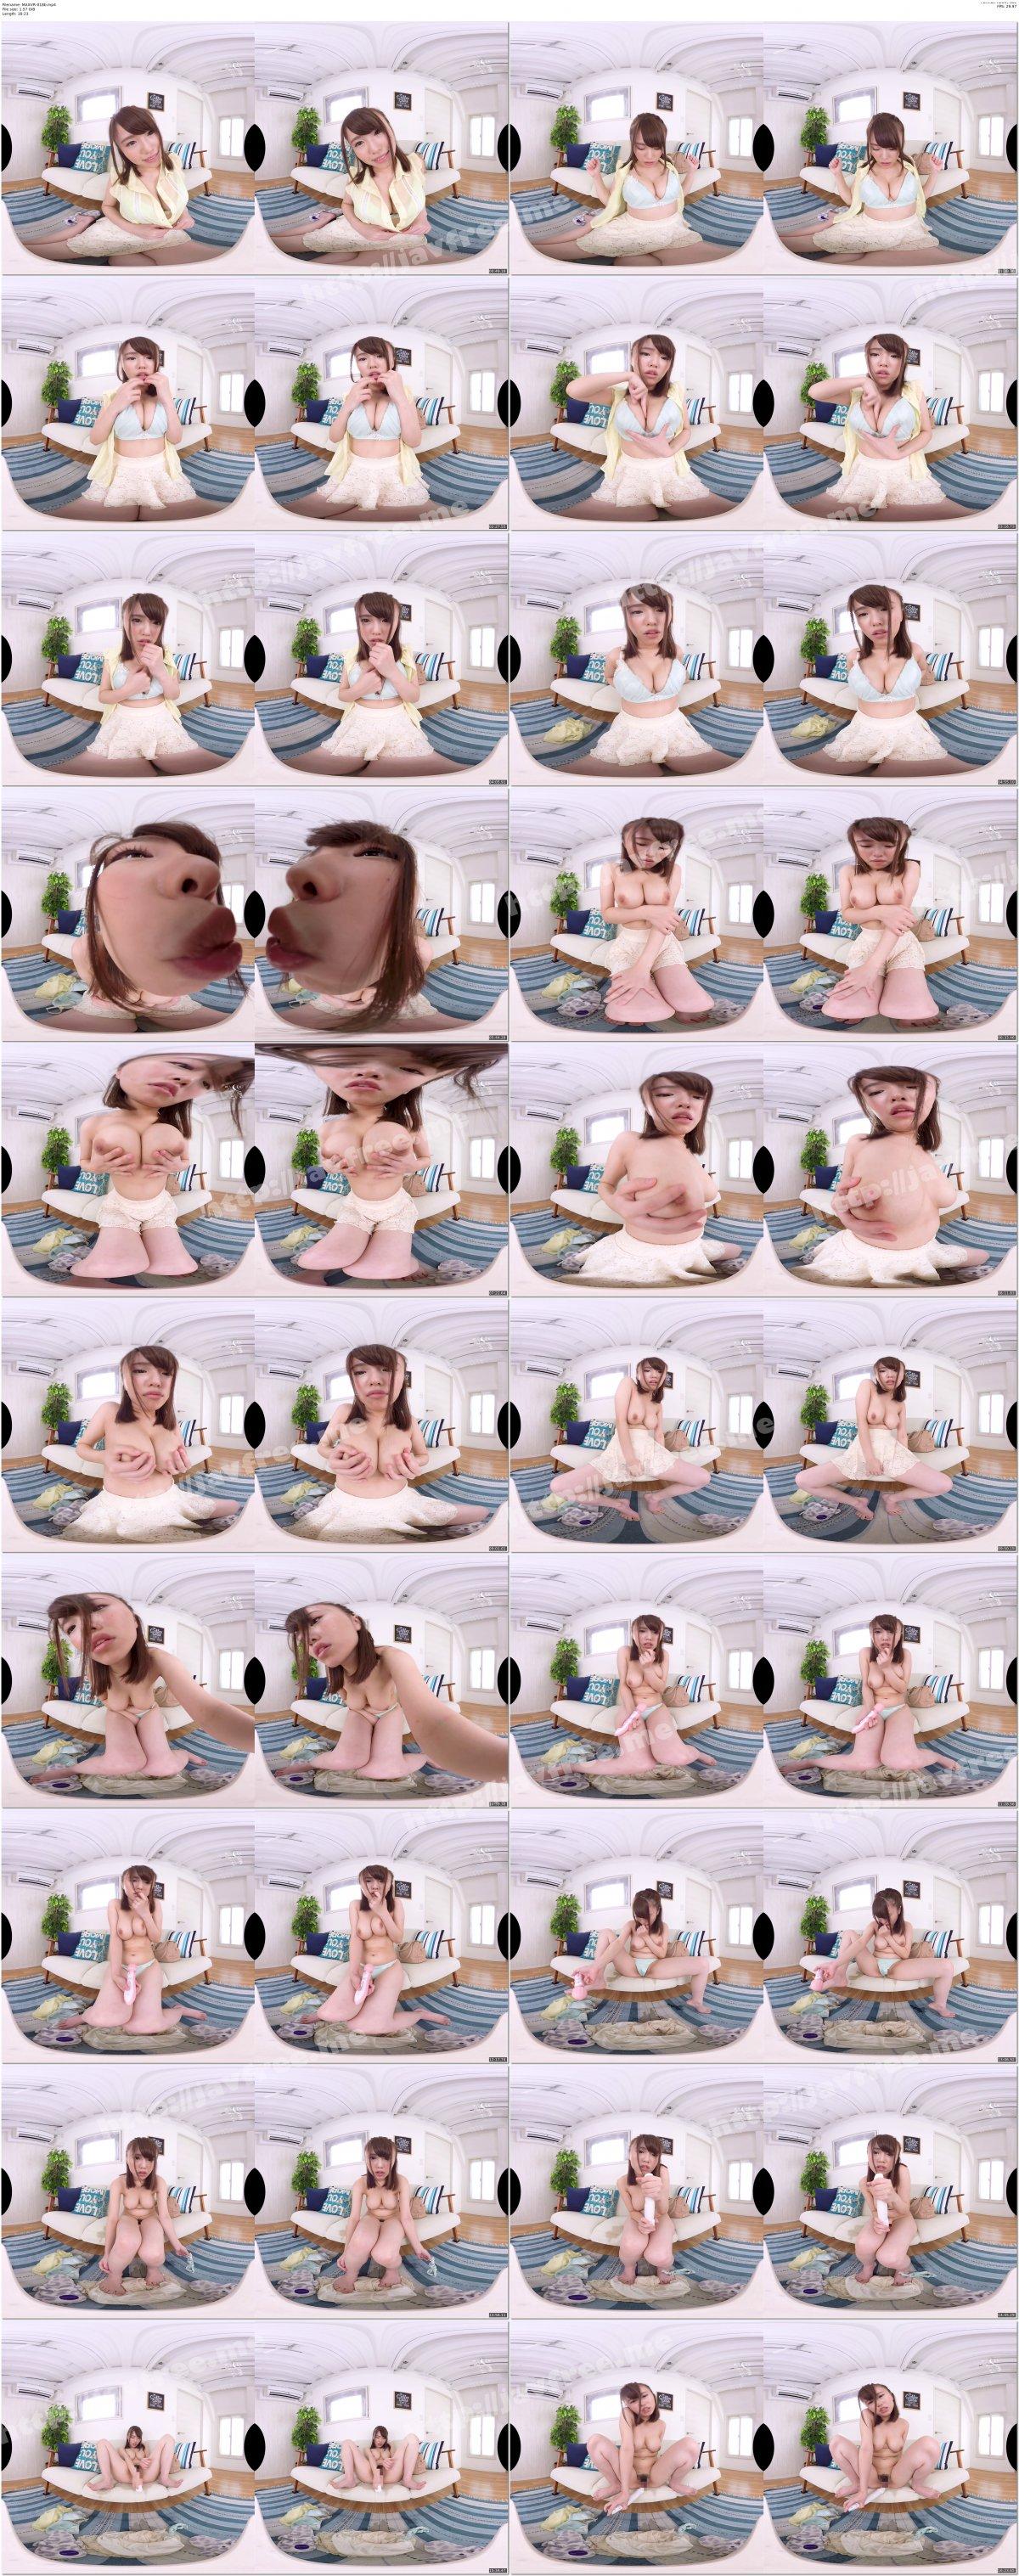 [MAXVR-018] 【VR】高画質 森下美怜 みんなが見るから…大人しい女の子が変態女に変貌して、大潮噴き!激イキ!痙攣!2連続中出し! - image MAXVR-018b on https://javfree.me